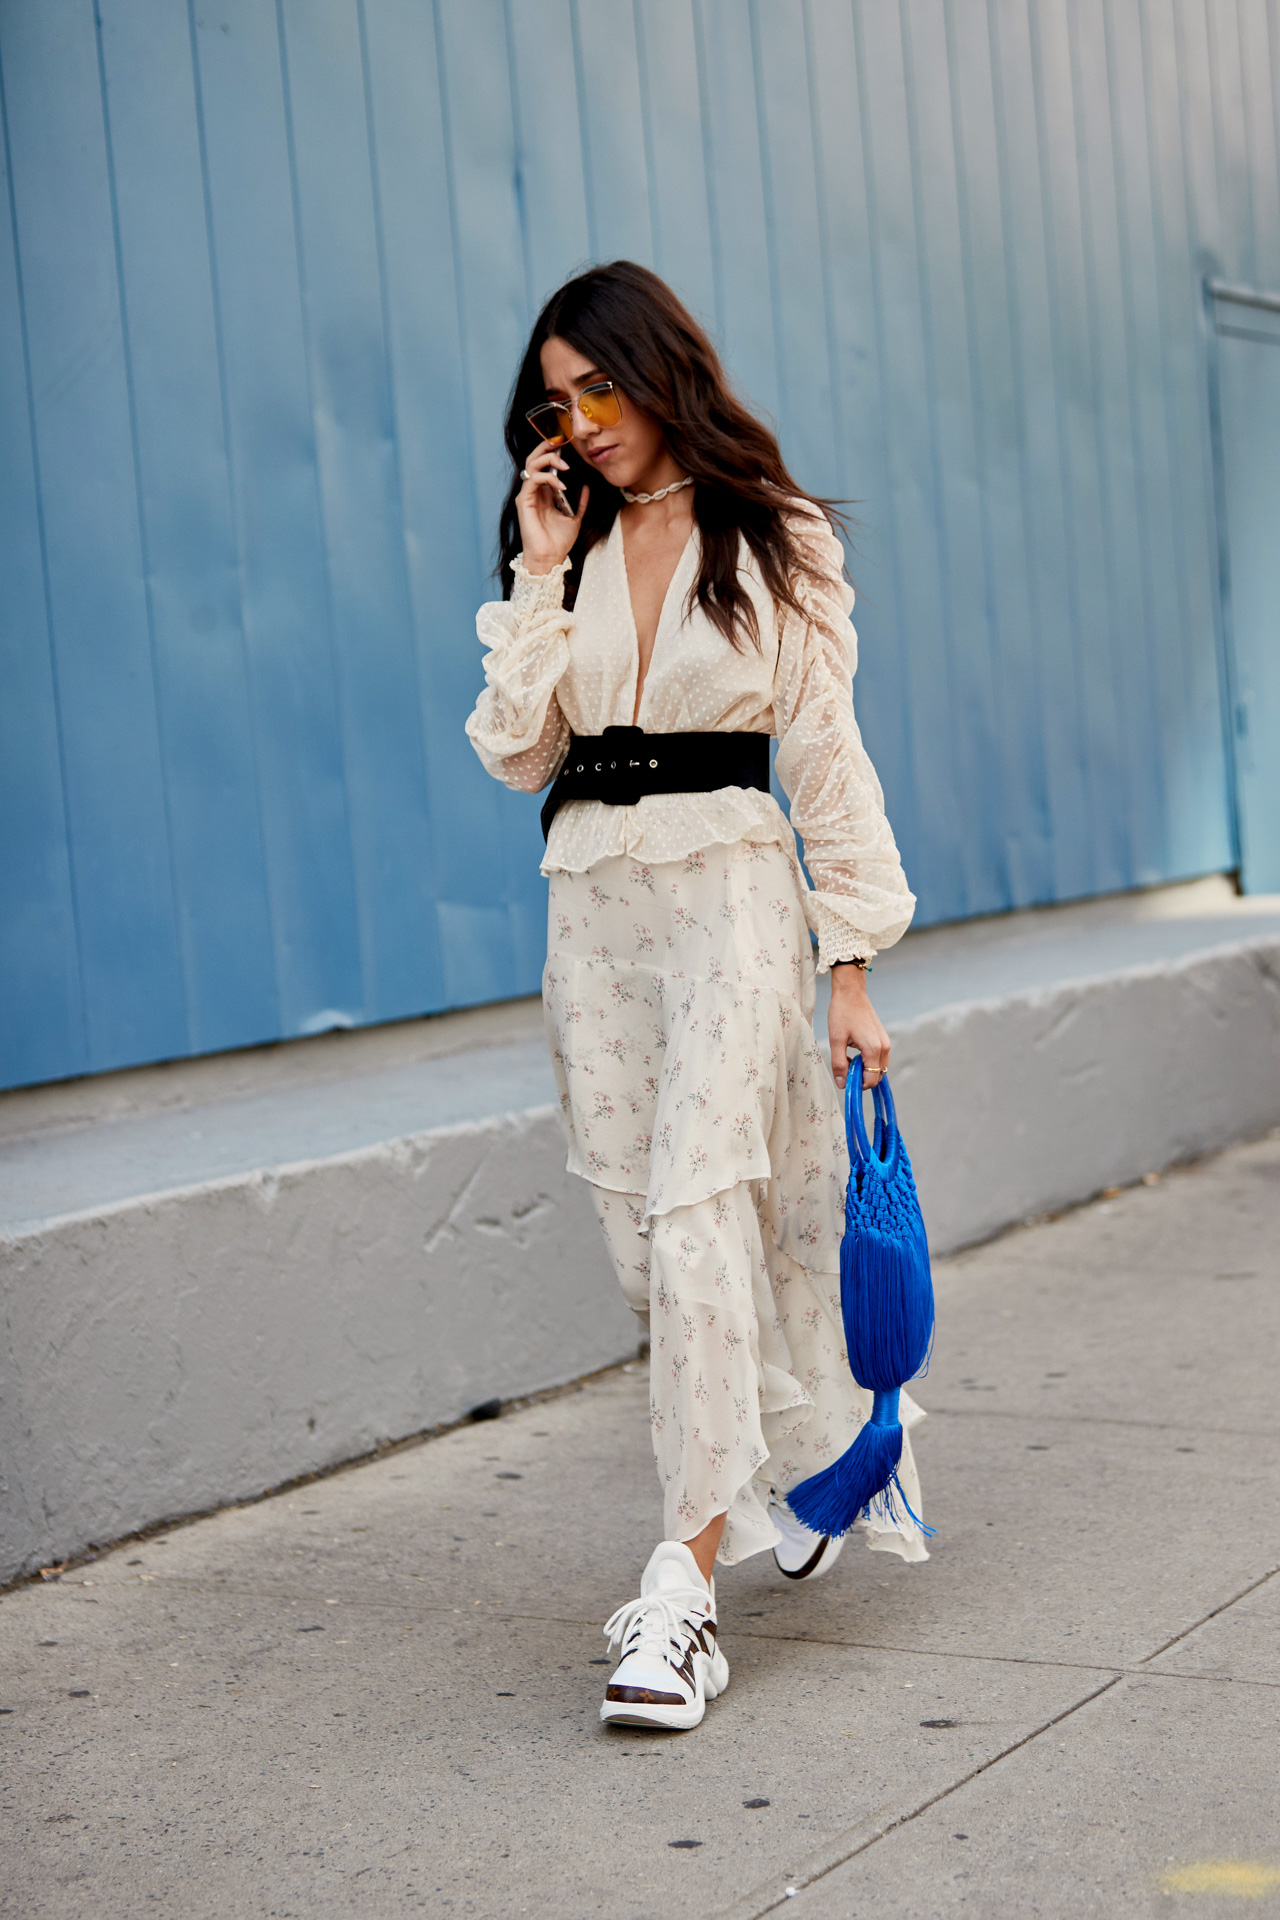 Fashion Week Spring/Summer 2019 Part 1 - The Style Stalker